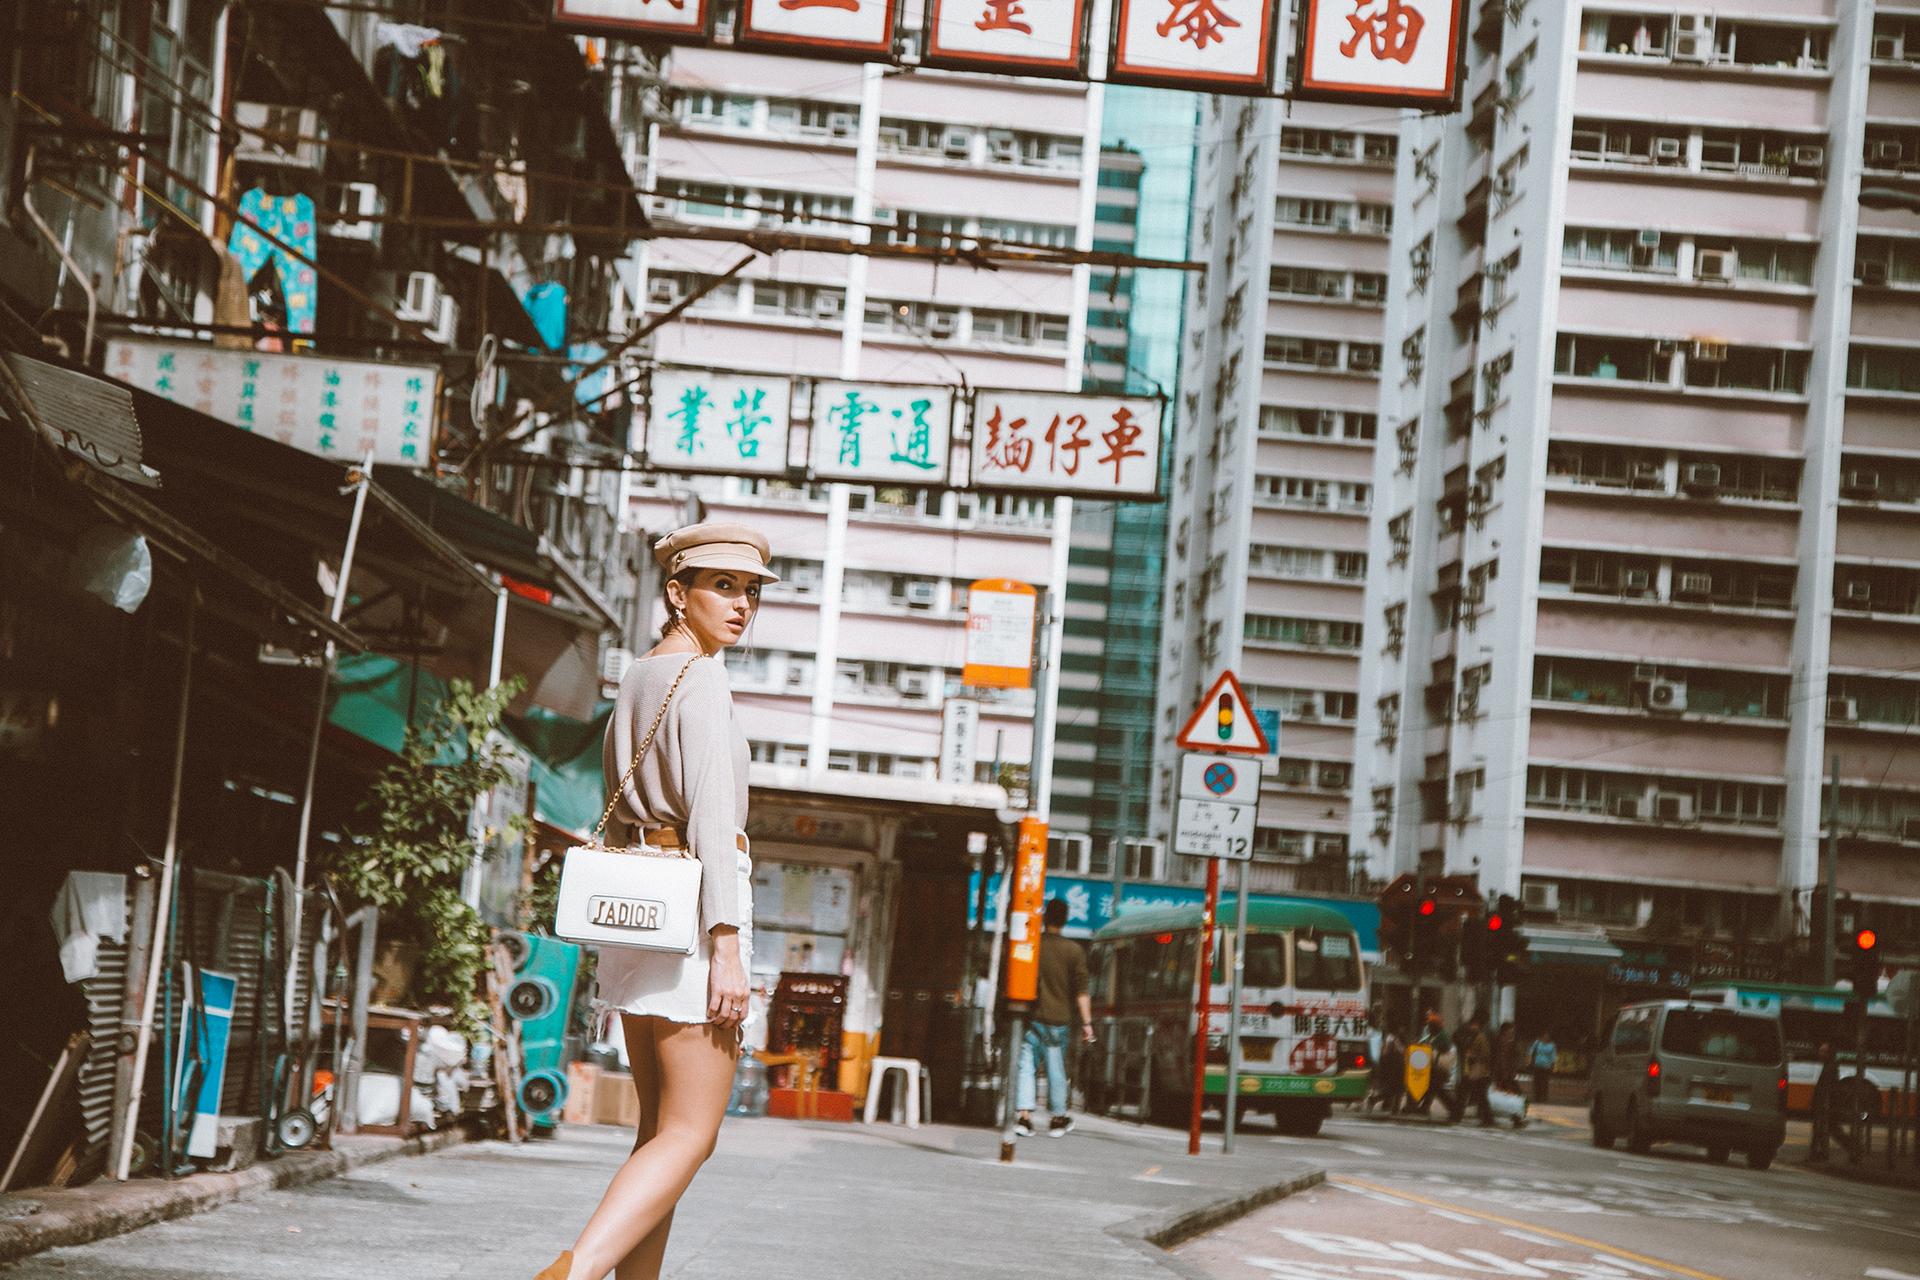 HONG KONG 5-21